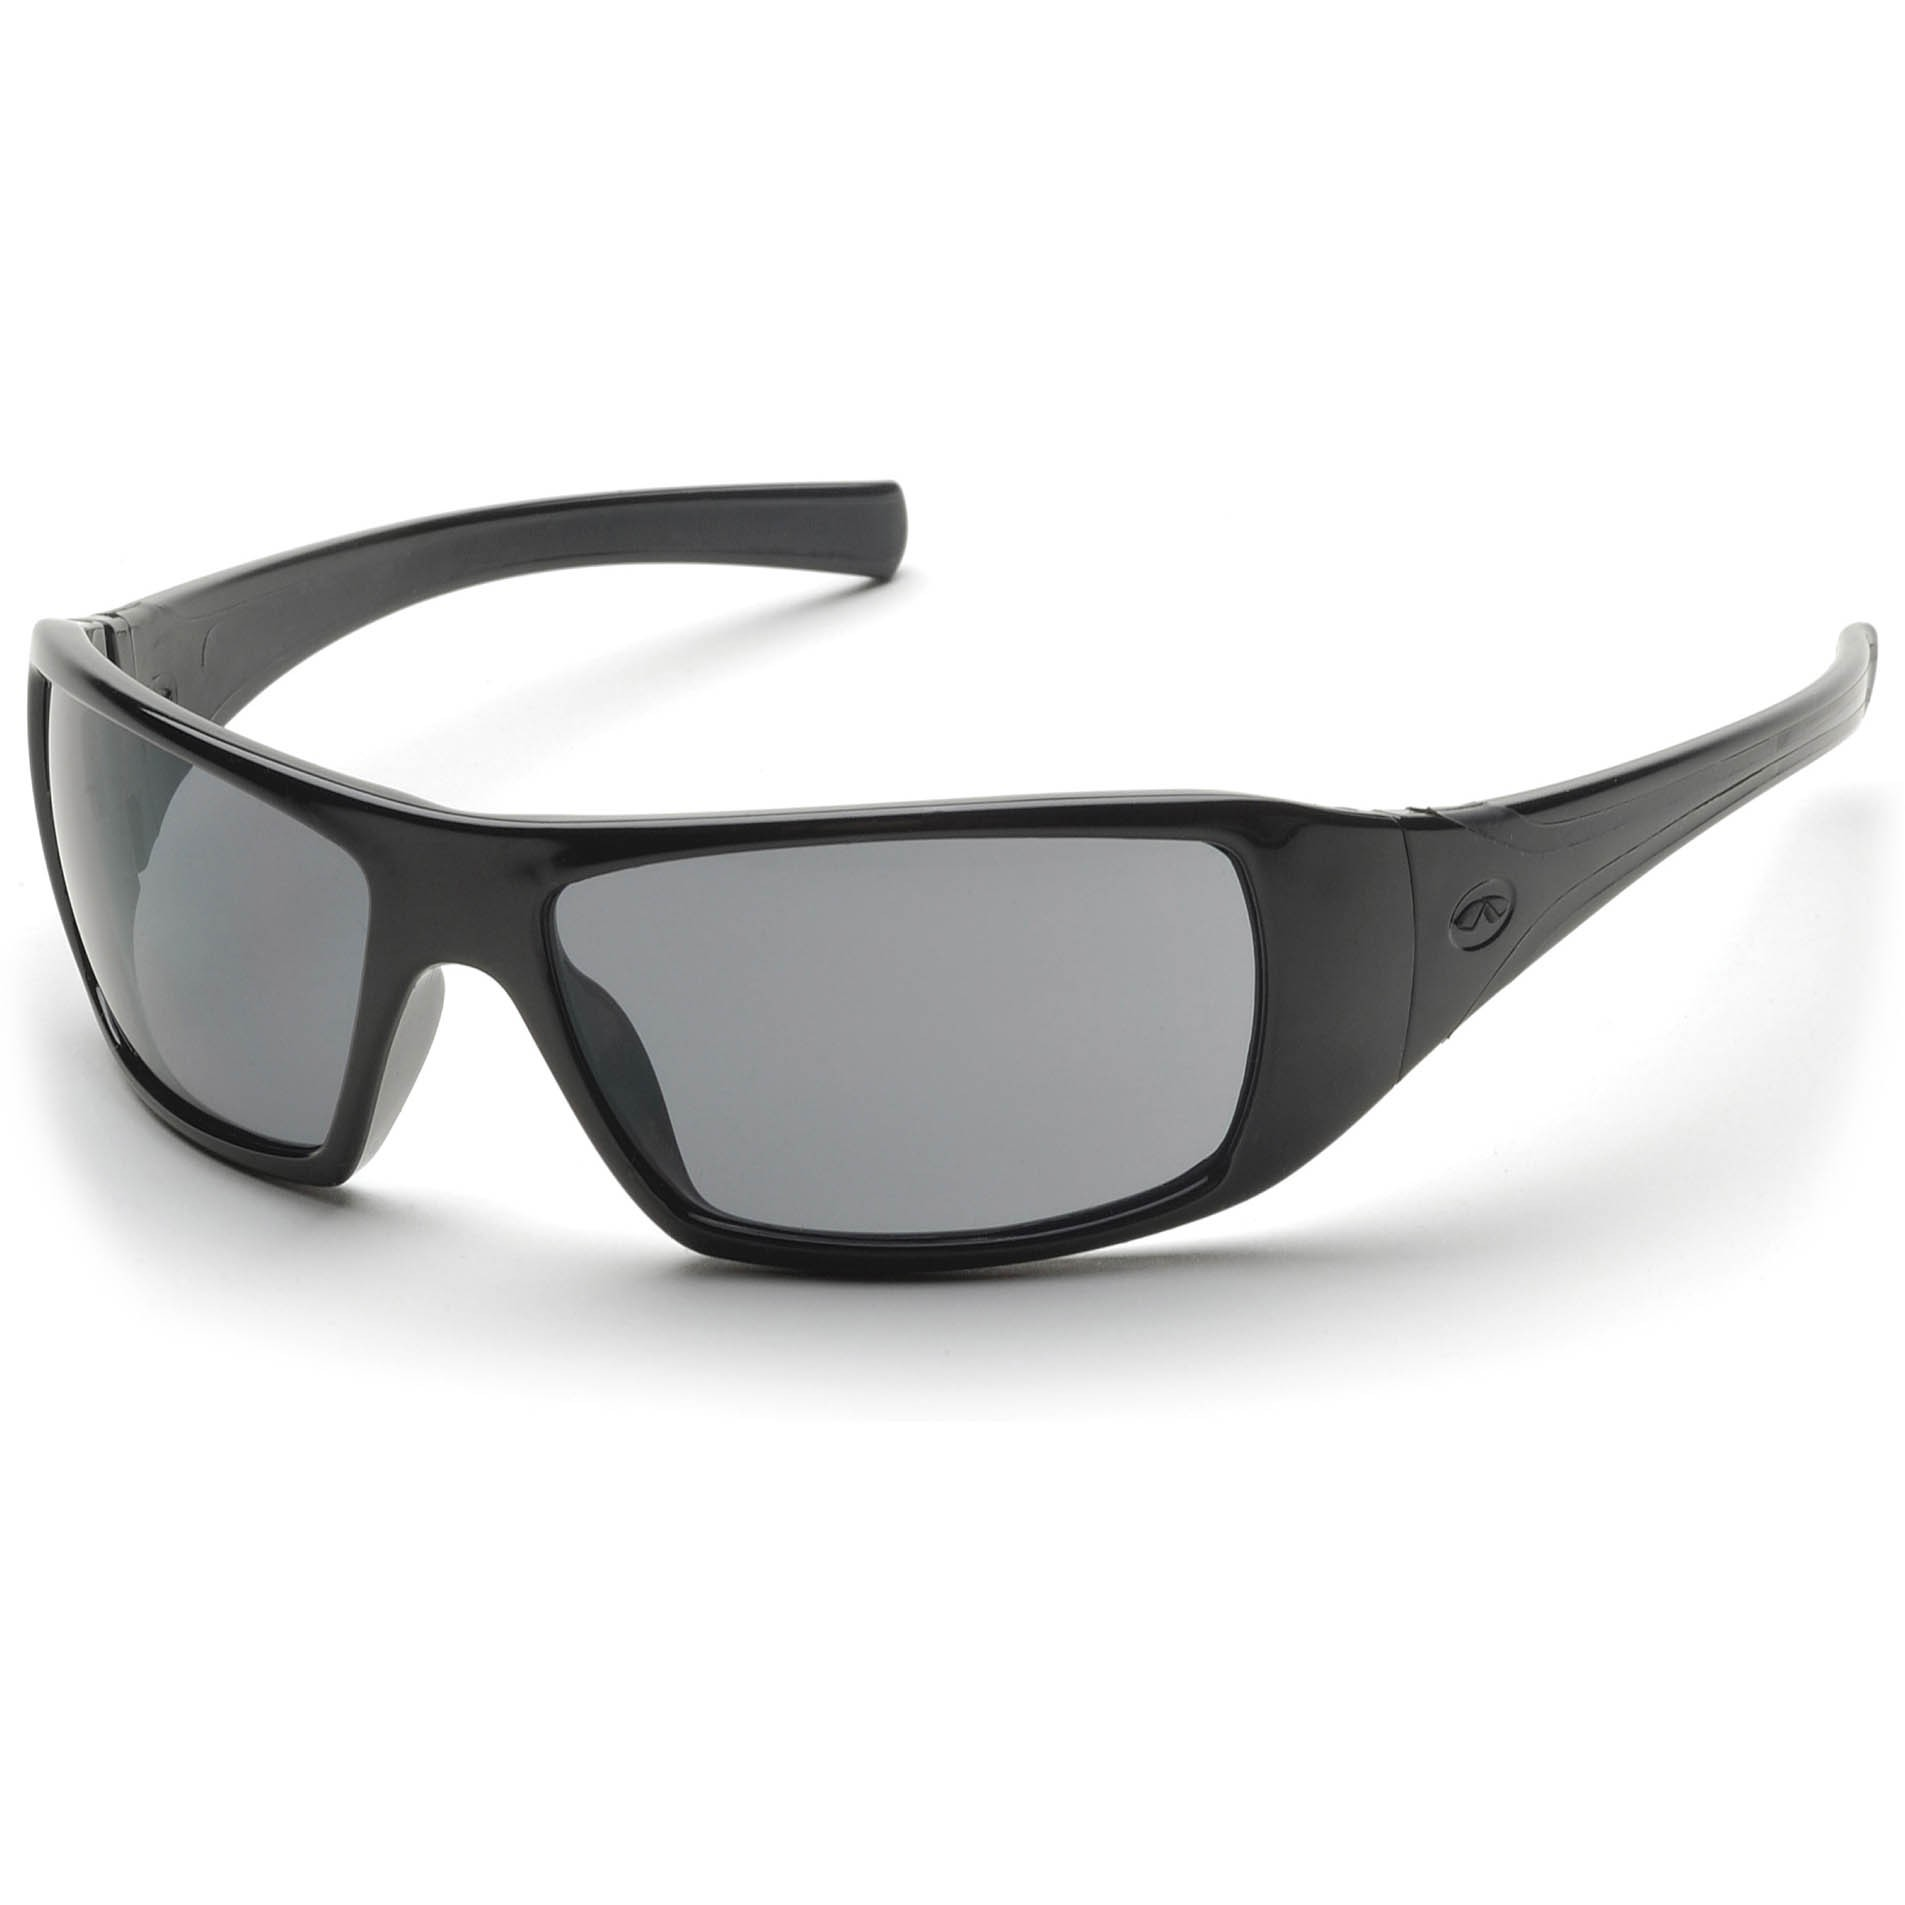 Glasses Gray Frame : Pyramex Goliath Safety Glasses - Black Frame - Gray ...